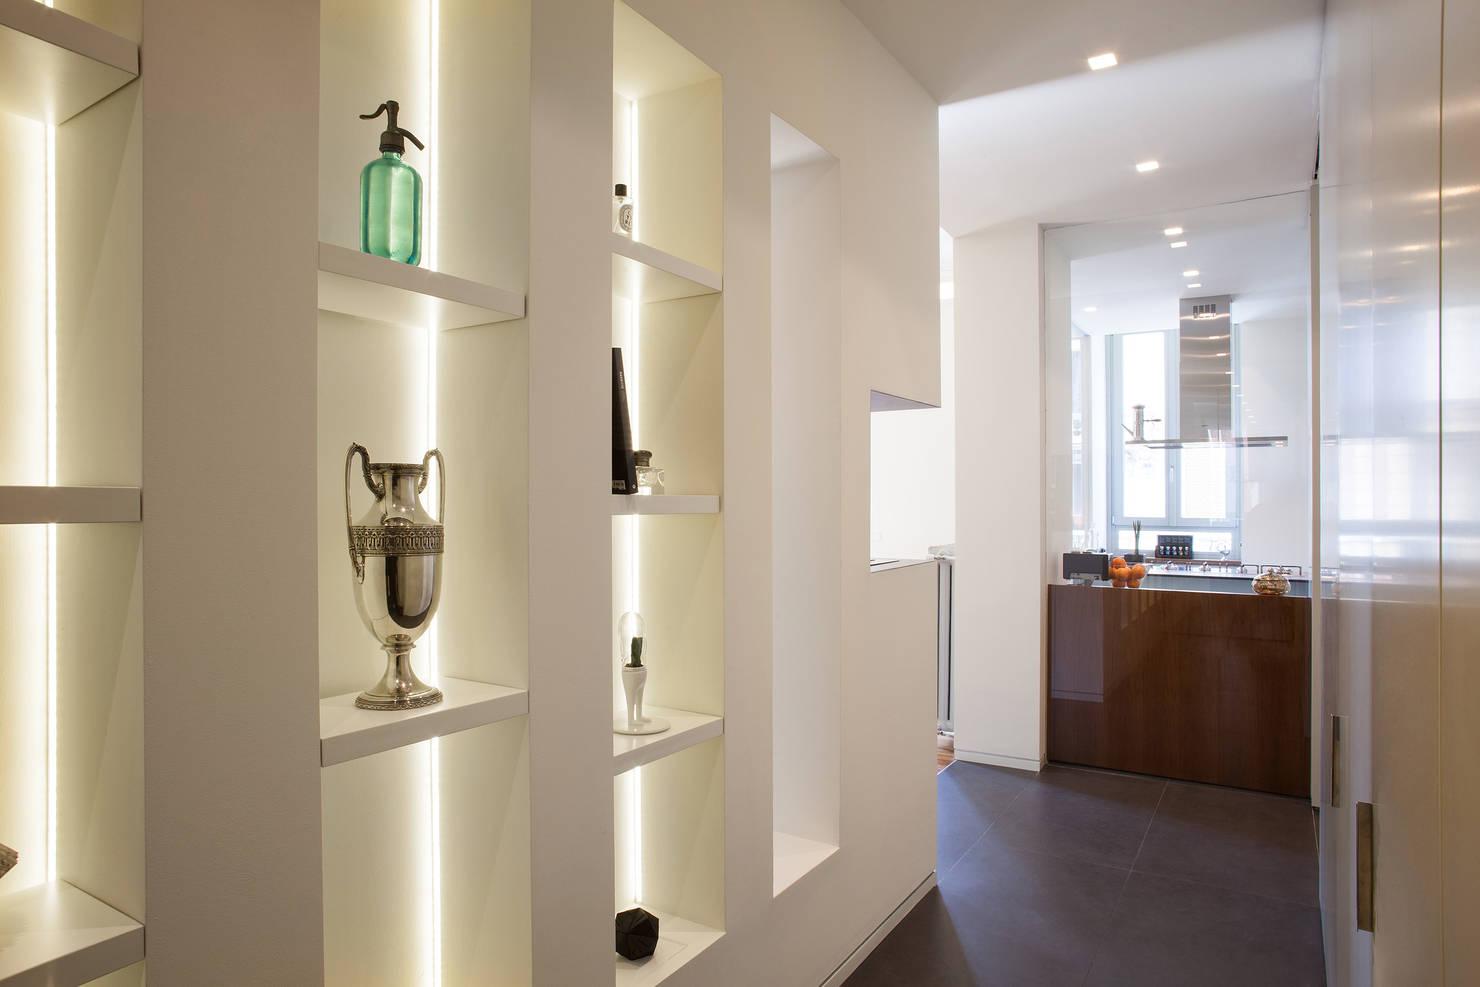 Un apartamento lleno de ideas ¡inspiradoras!